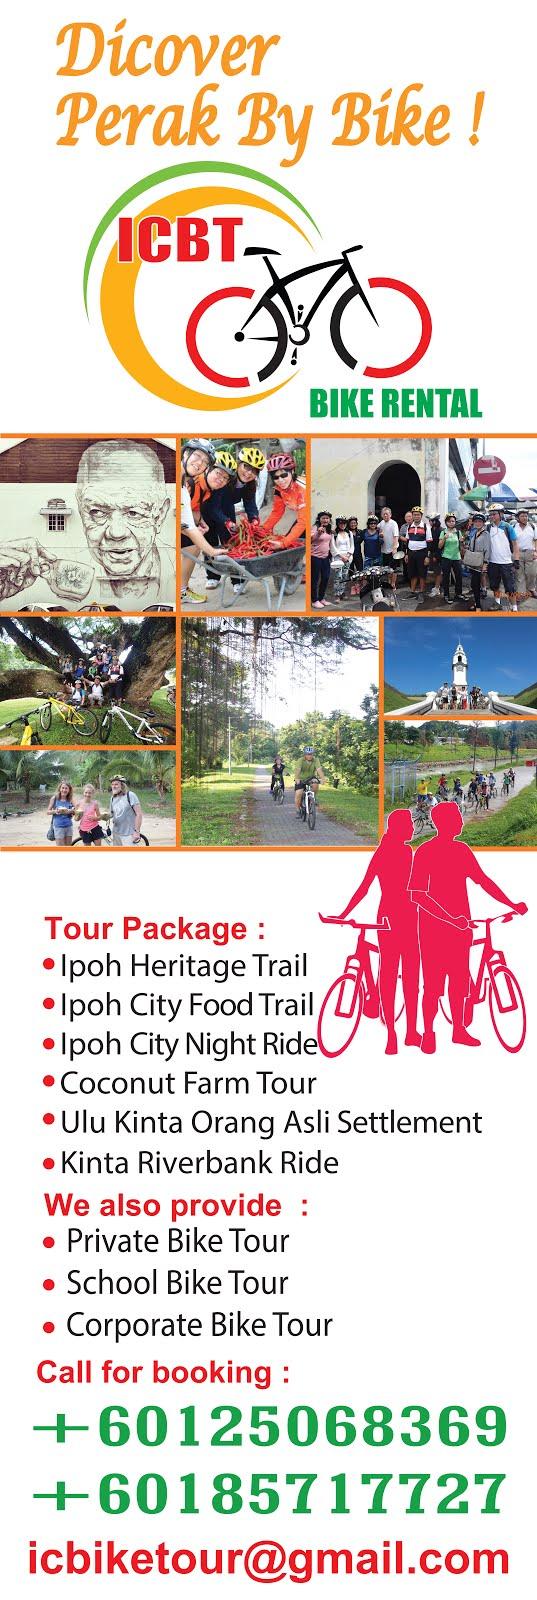 IPOH CITY BIKE TOUR/RENTAL